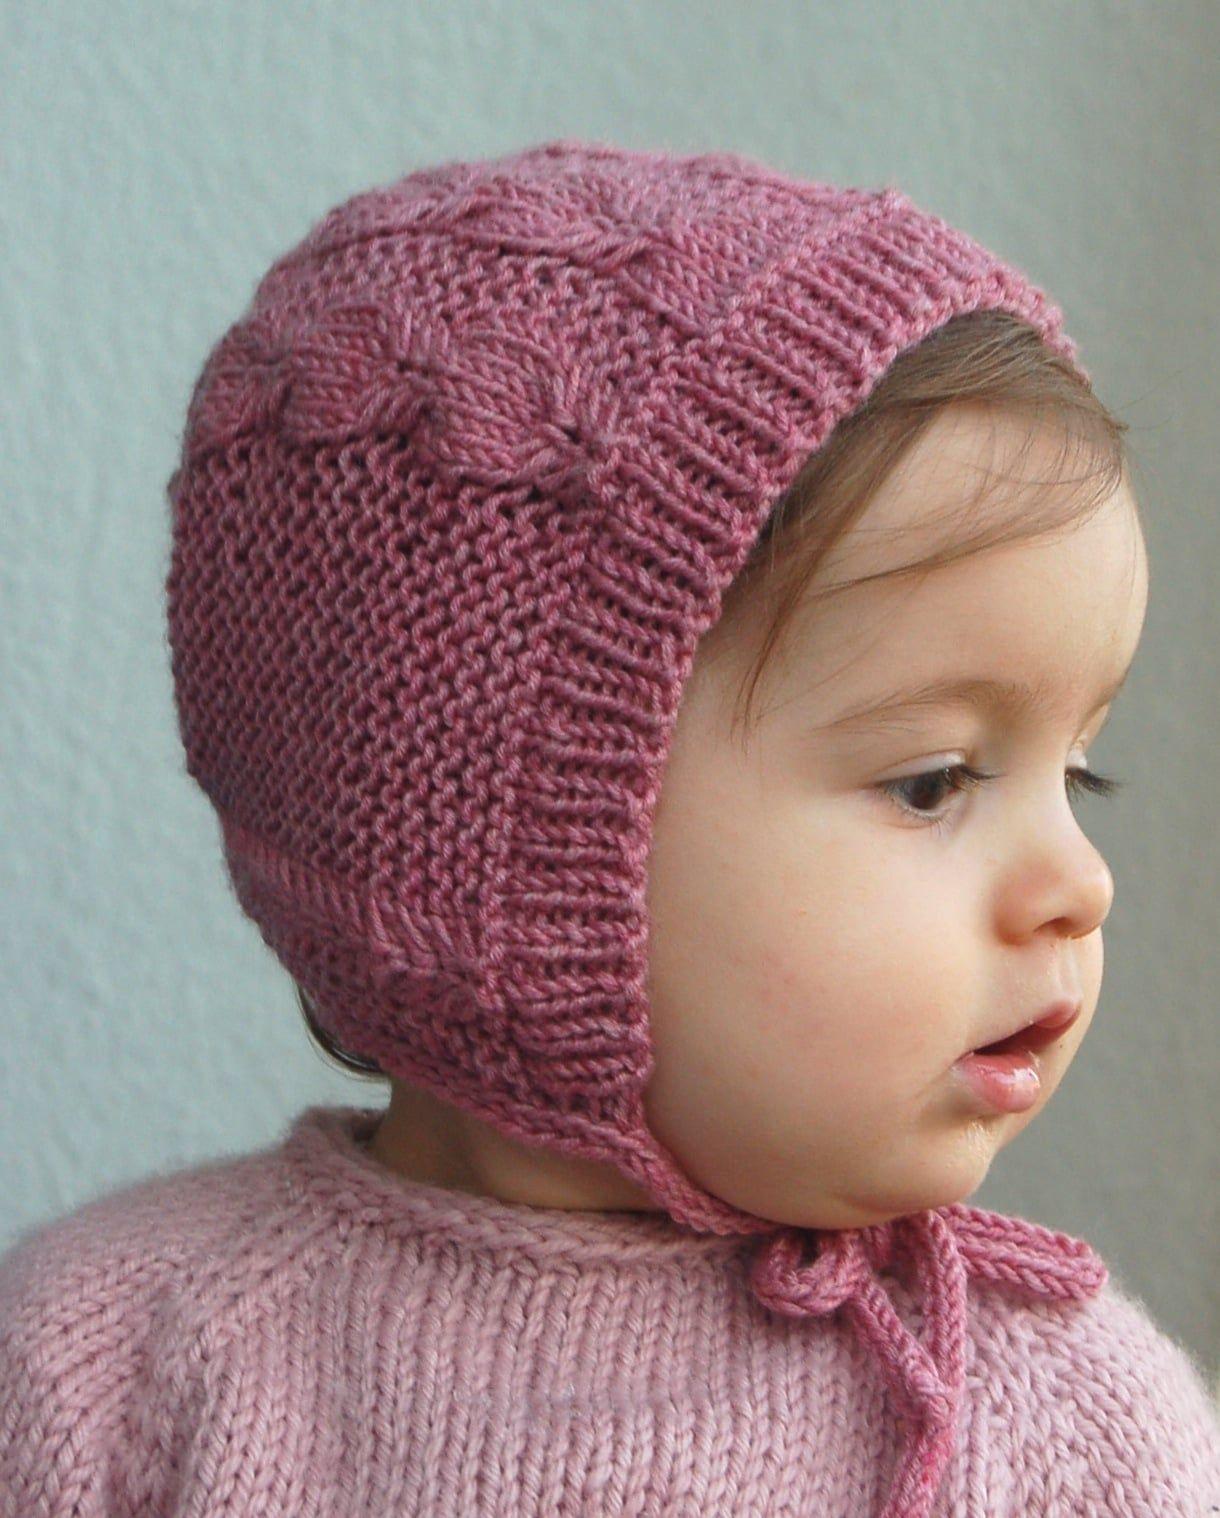 Perfect Gestricktes Muster Bonnet Model - Decke Stricken Muster ...